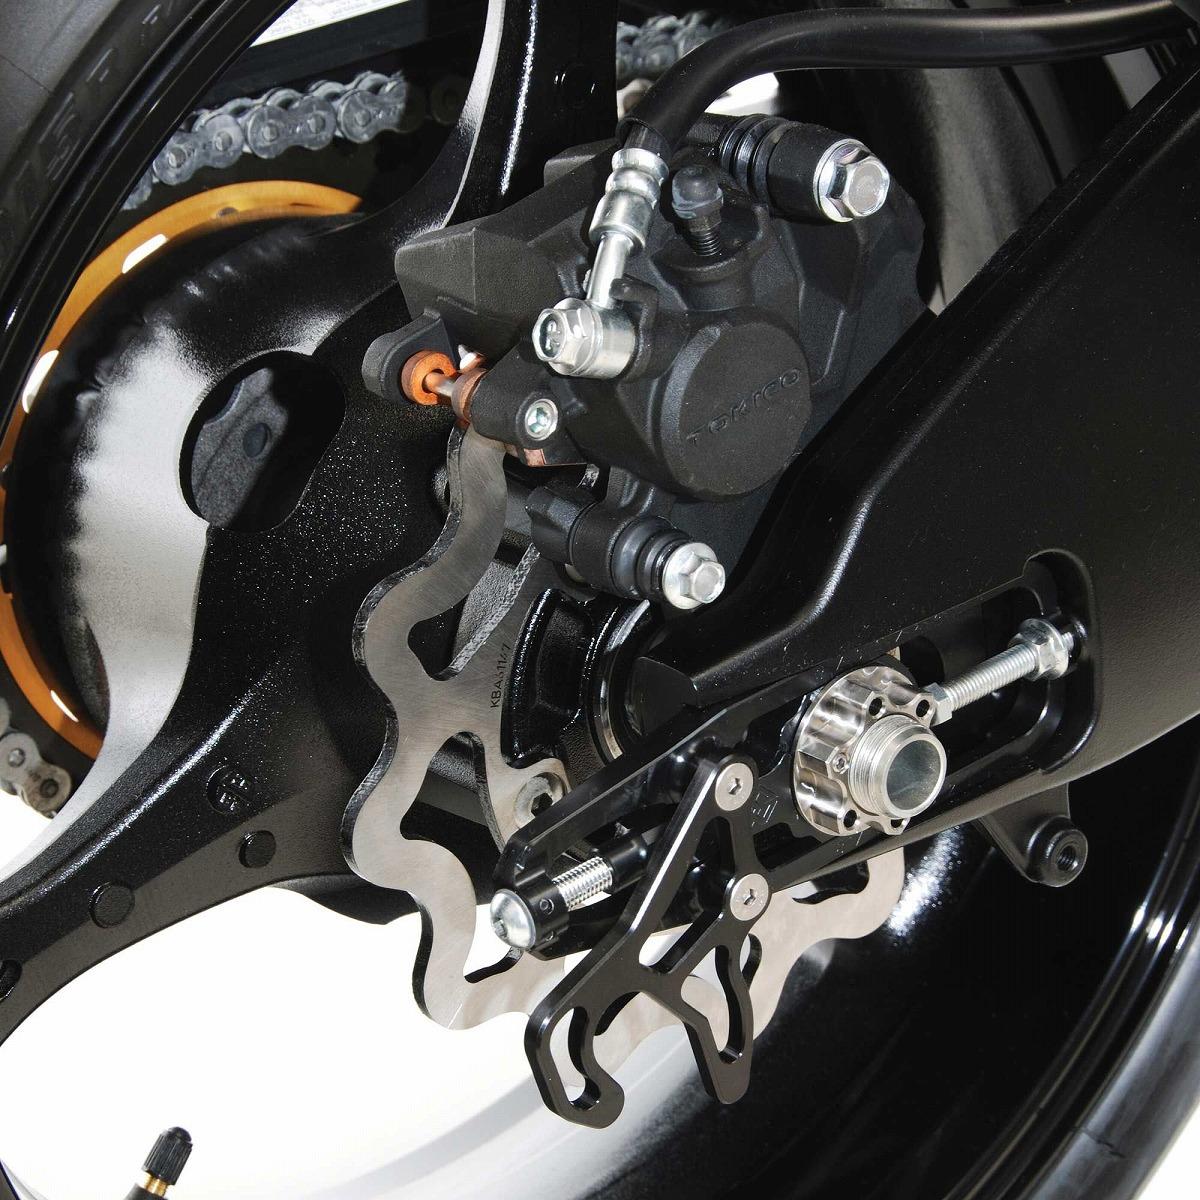 ☆【Galfer】オートバイウェーブブレーキディスク -DF183W